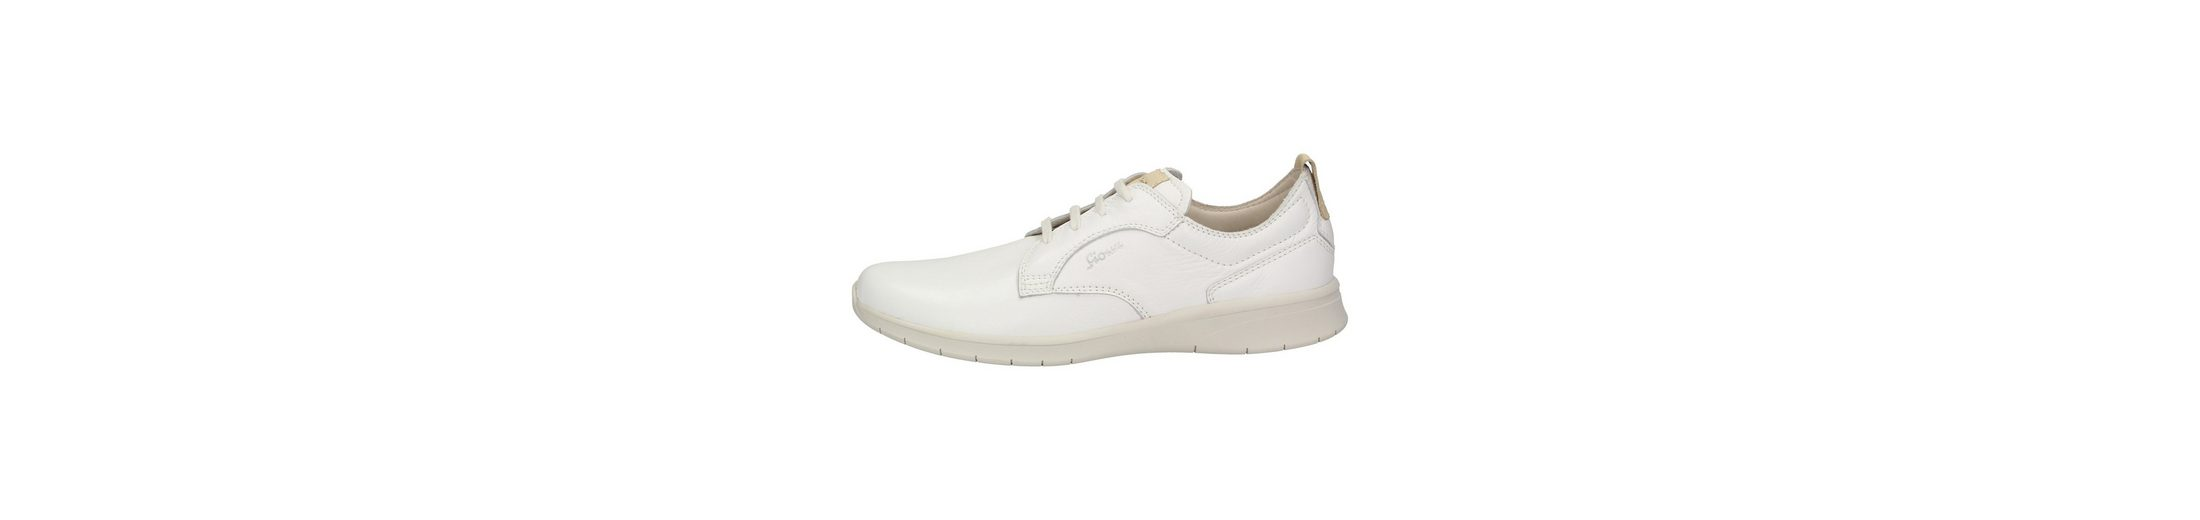 SIOUX Heimito-700-XL Sneaker